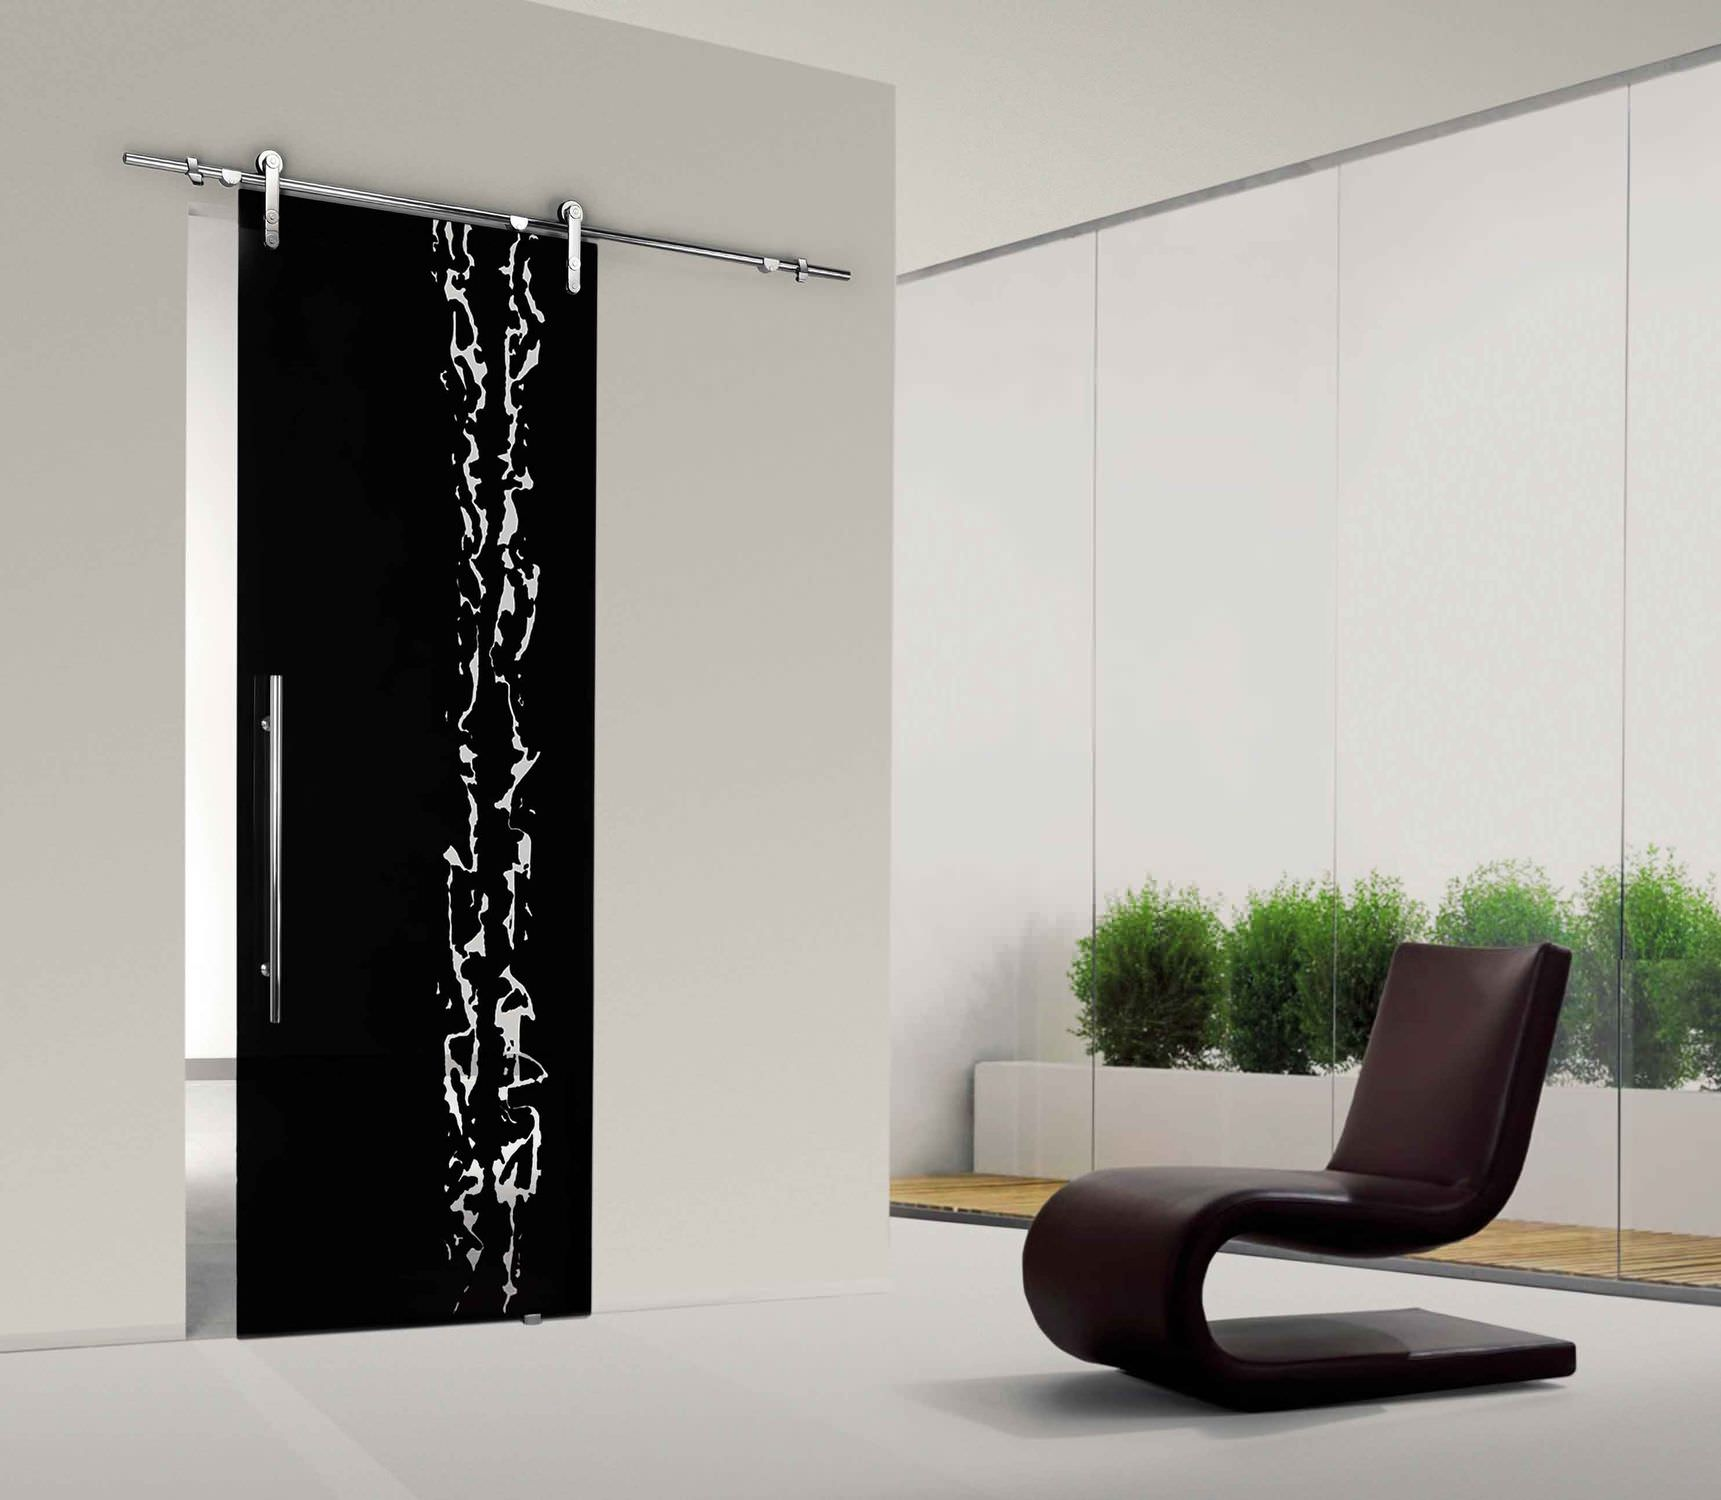 Porte coulissante en verre opaque menuiserie image et for Porte coulissante en verre pas cher